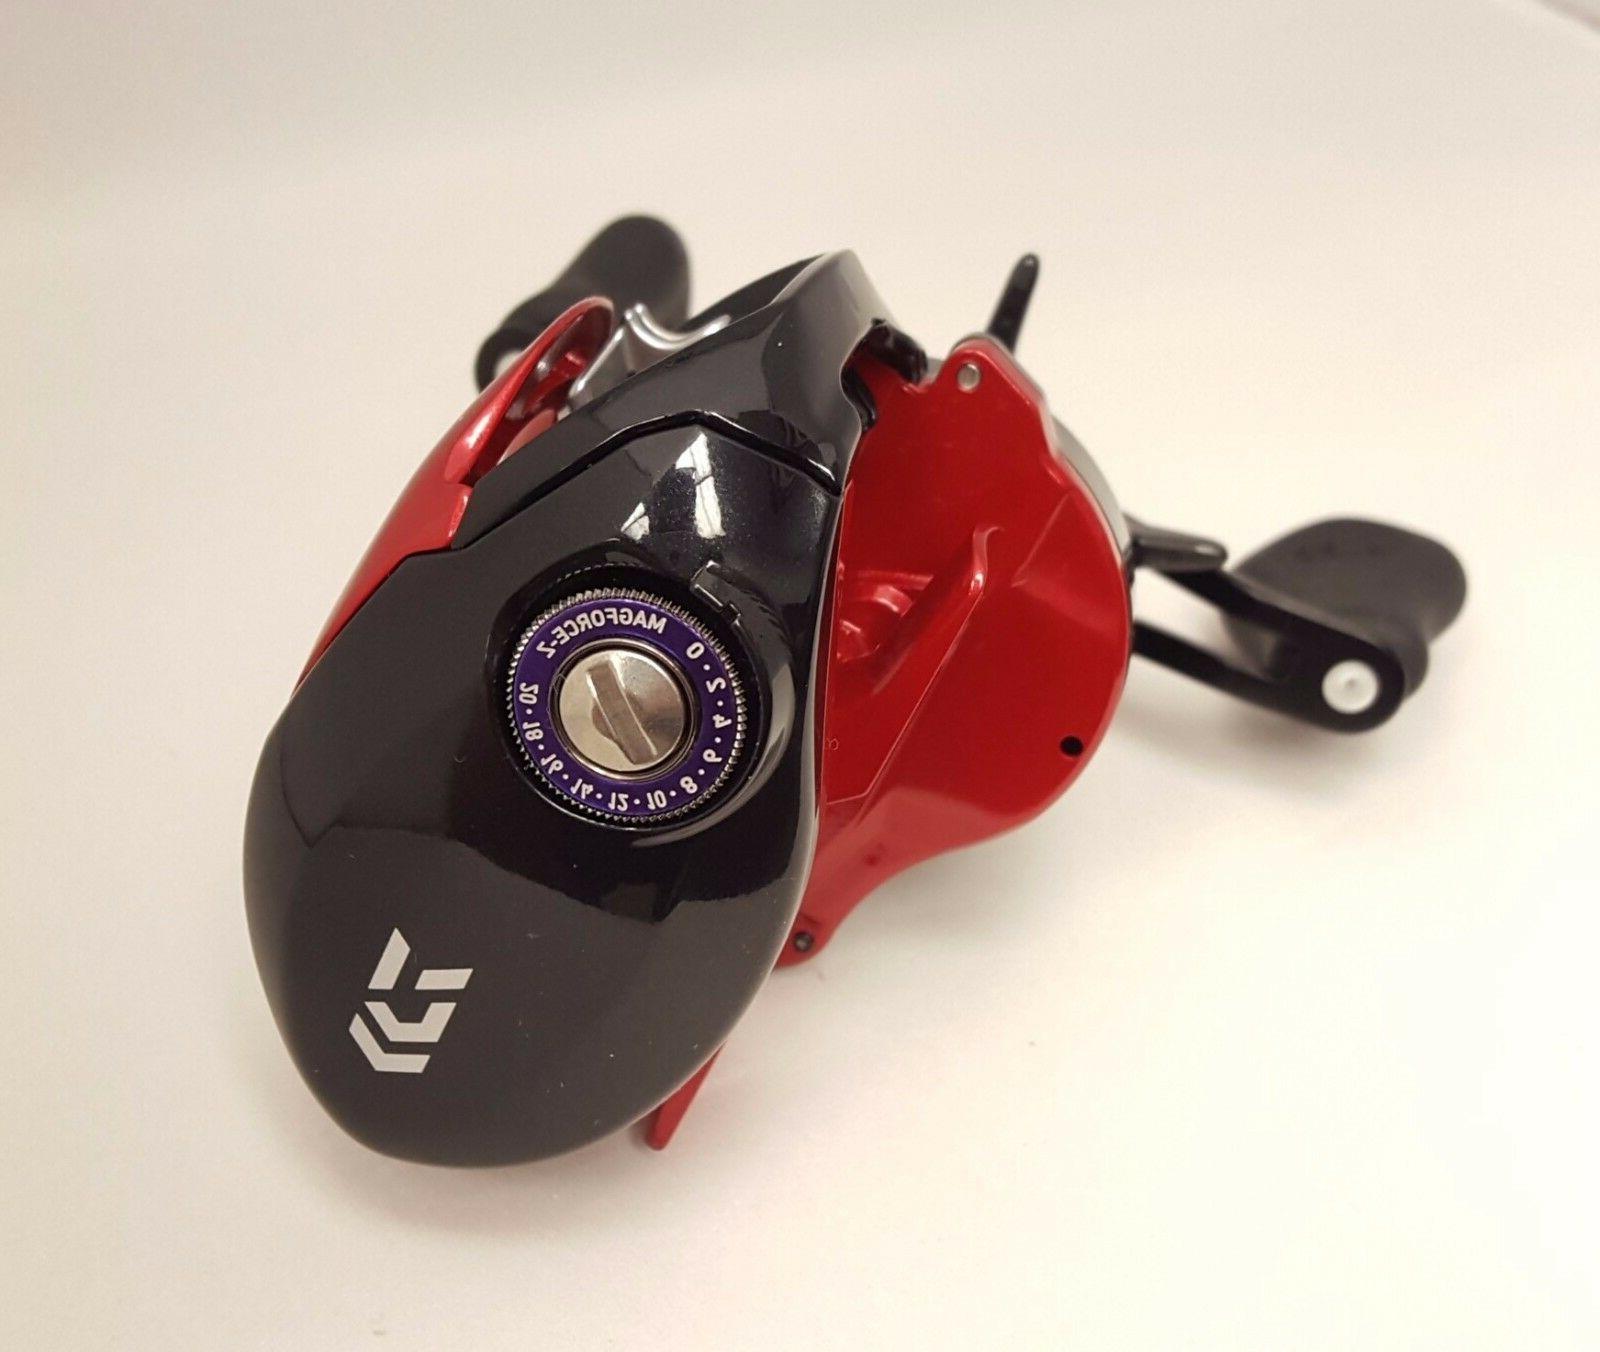 Daiwa Tatula Type-R 100XS Hyper Right TACT-R100XS